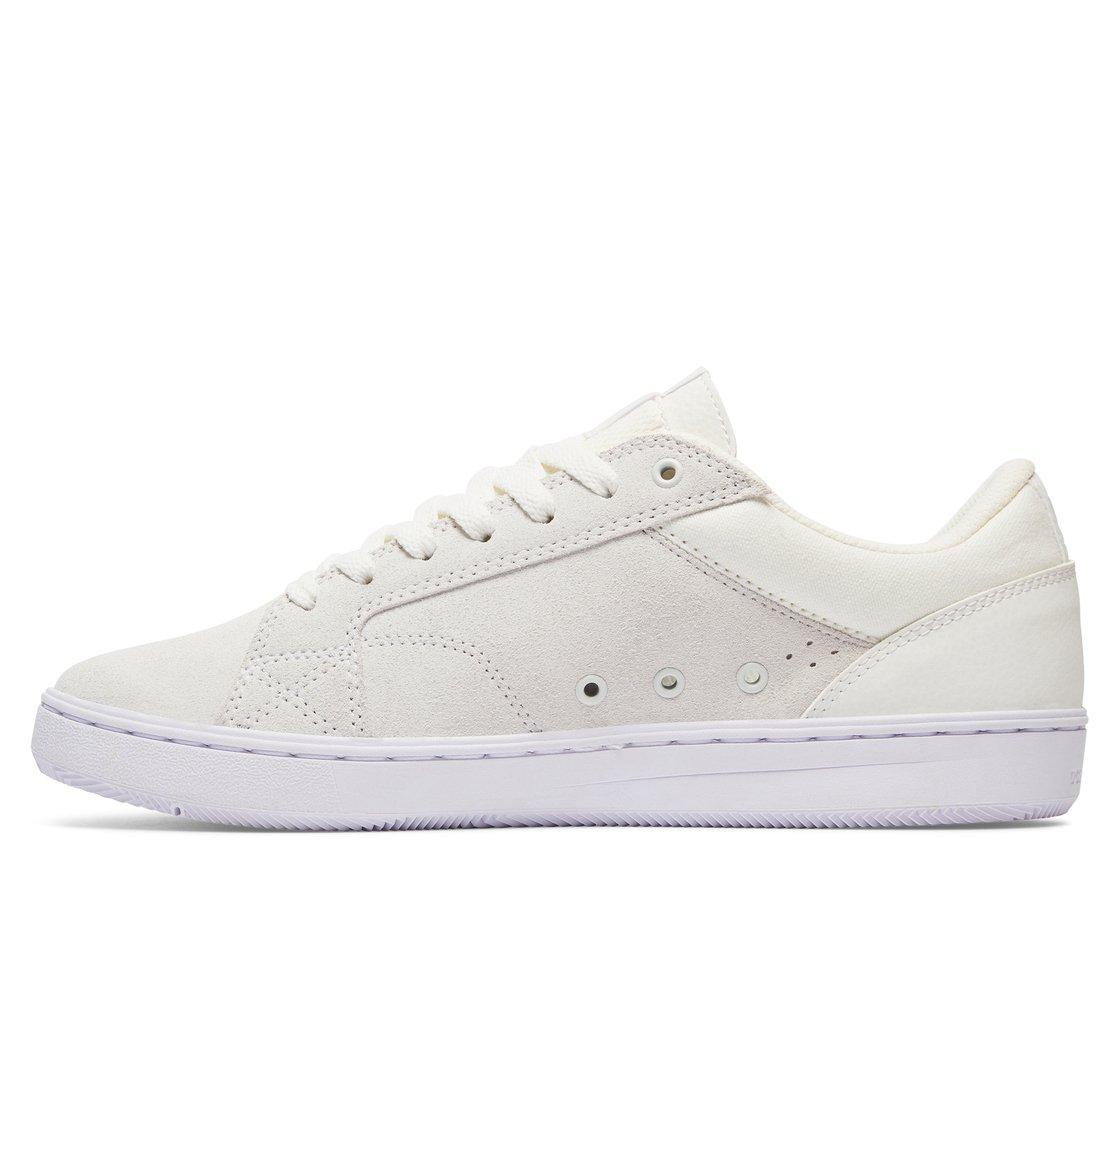 DC Shoes ASTOR - Skate shoes - white / black 9KAZQKyd